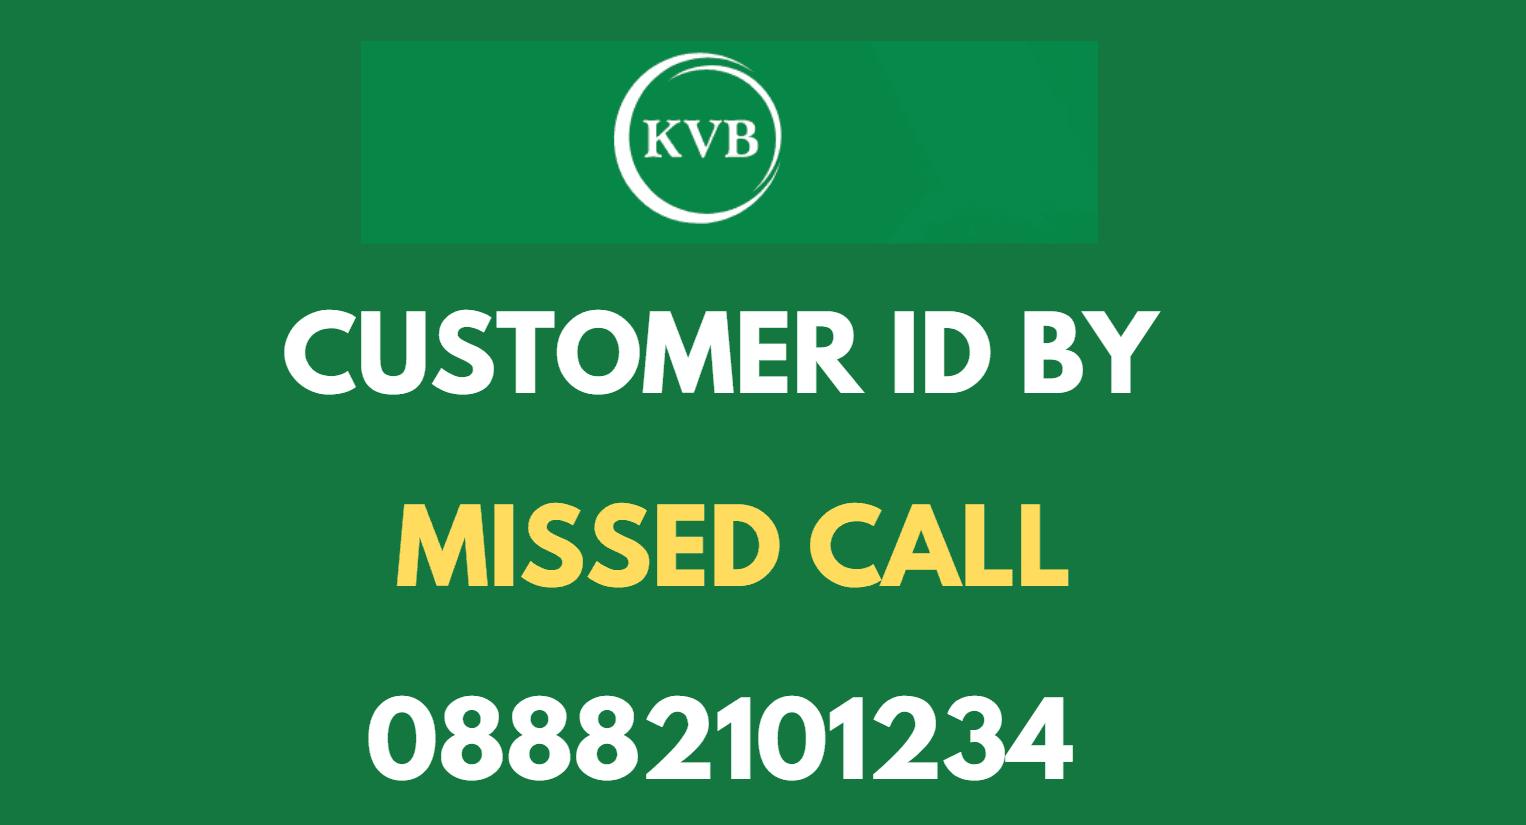 Karur Vysya Bank Customer ID check number